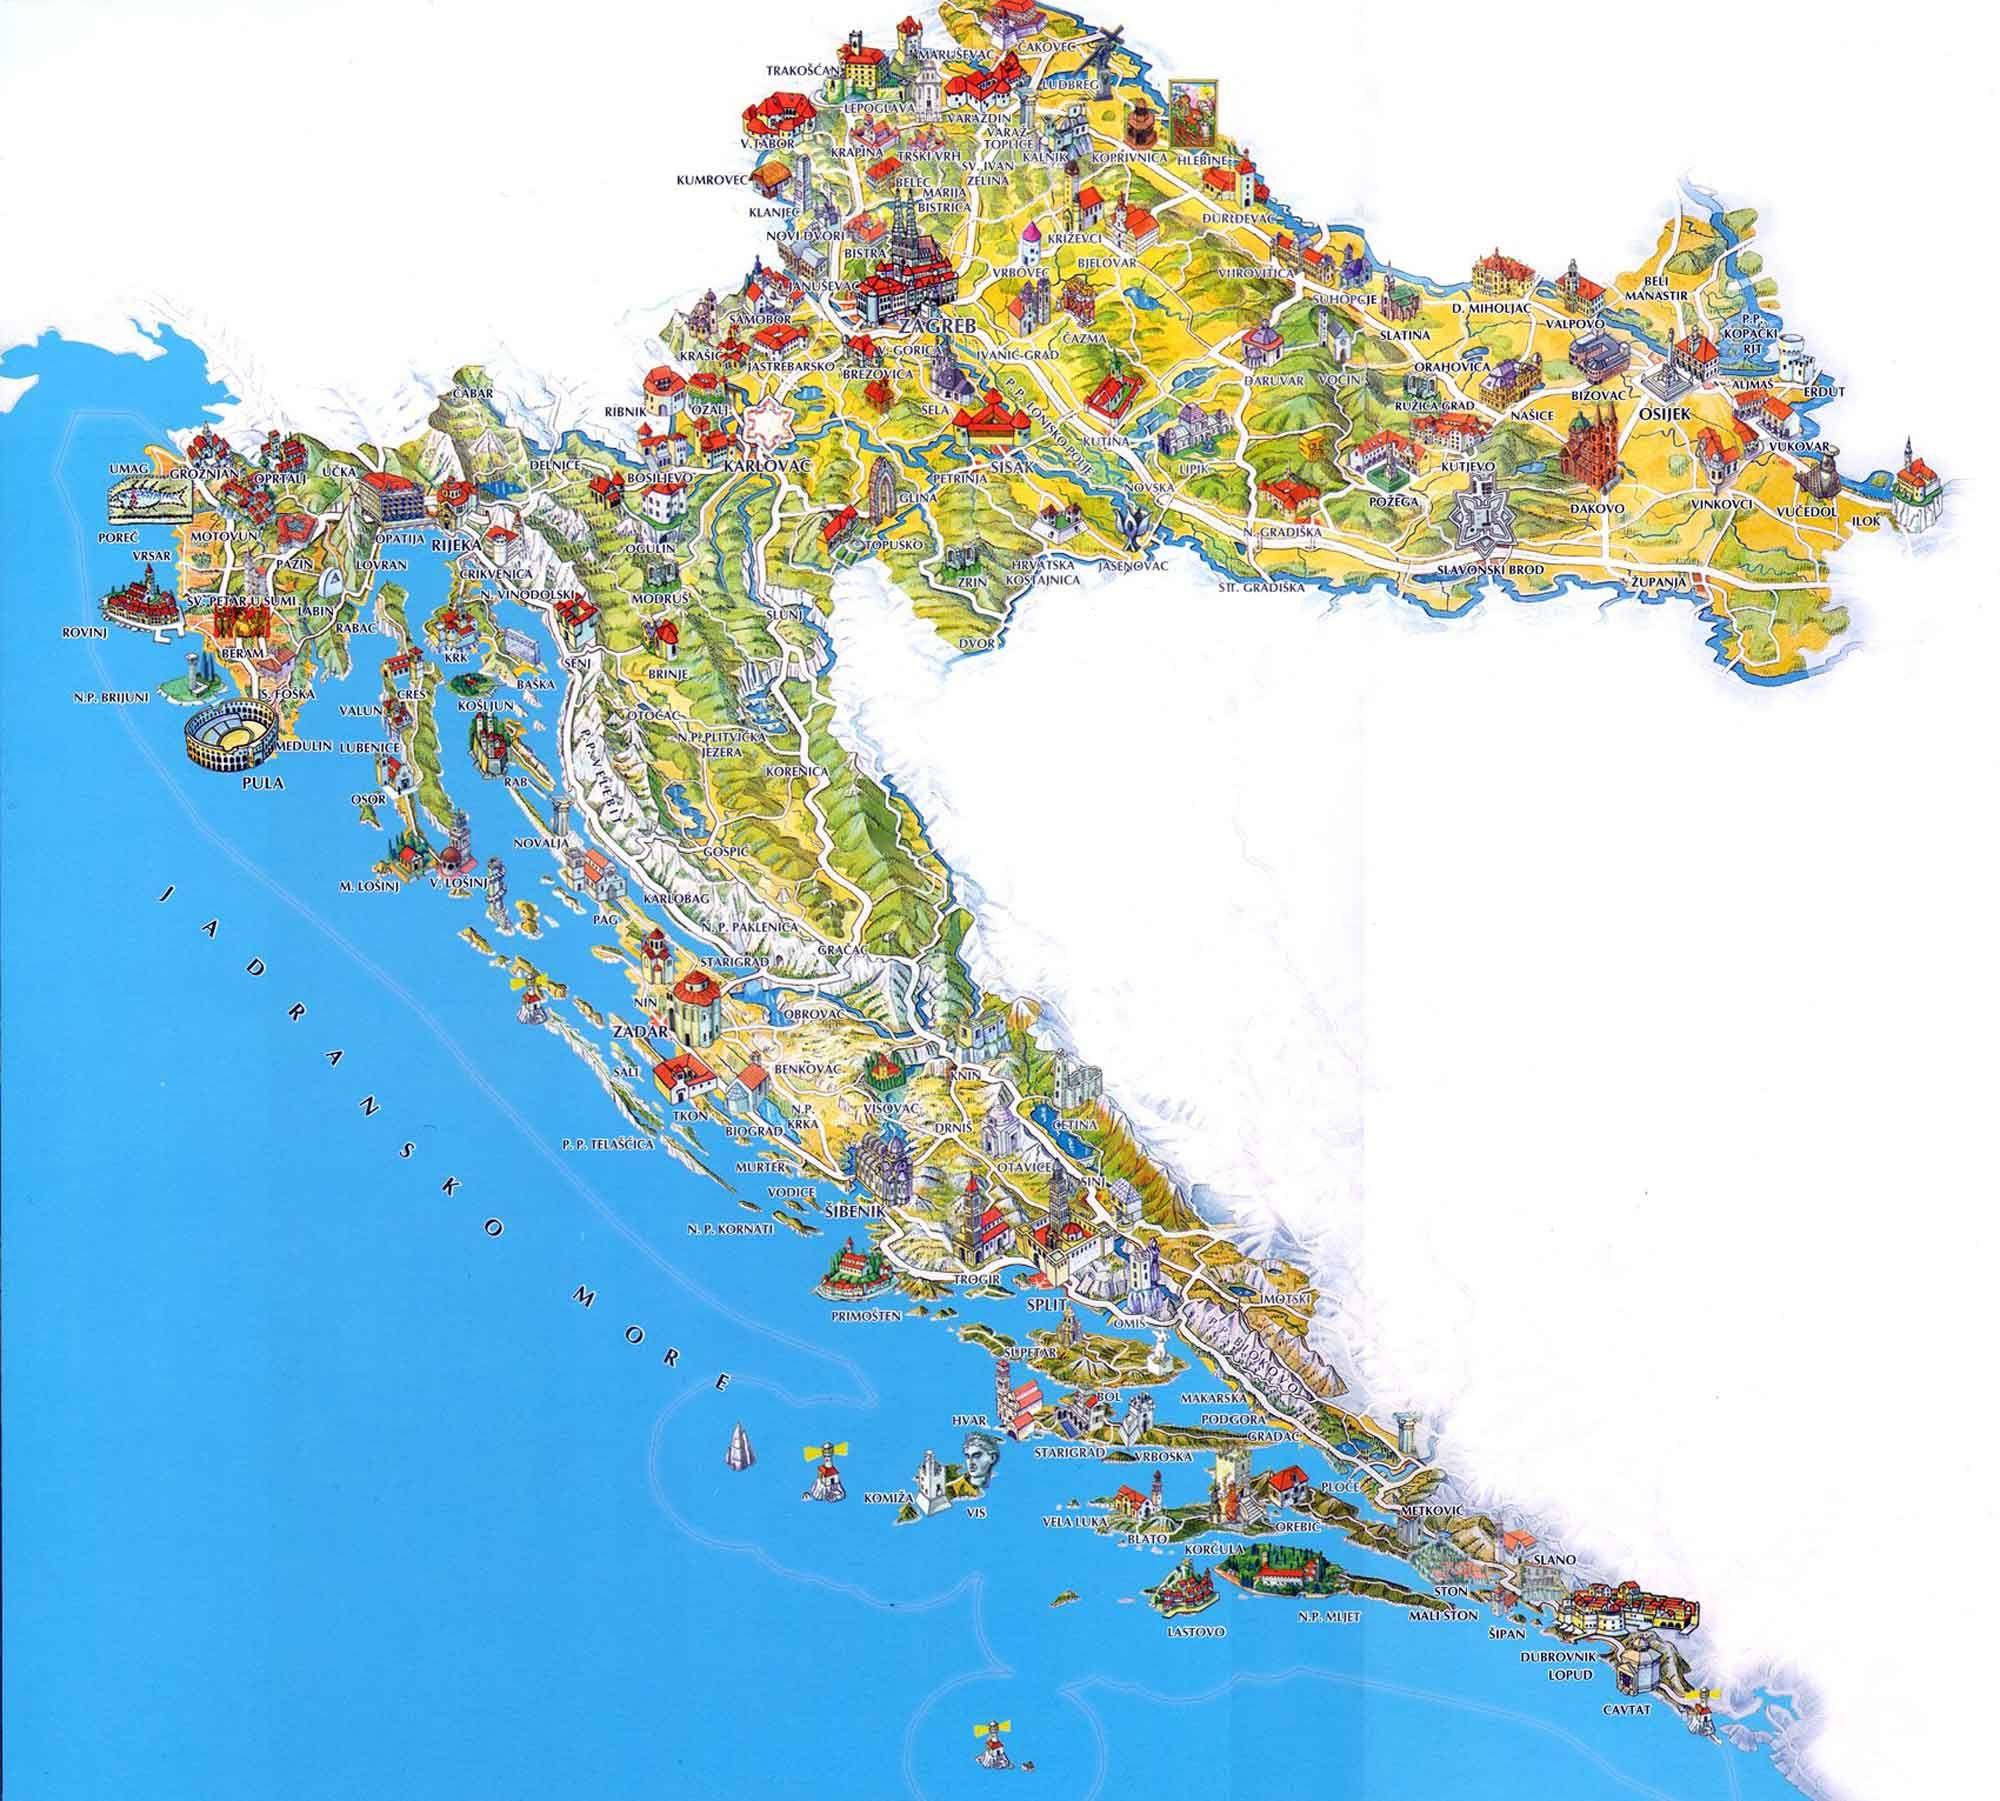 Mapahorvatiya2 Jpg 2000 1801 Croatia Map Croatia Tourist Tourist Map